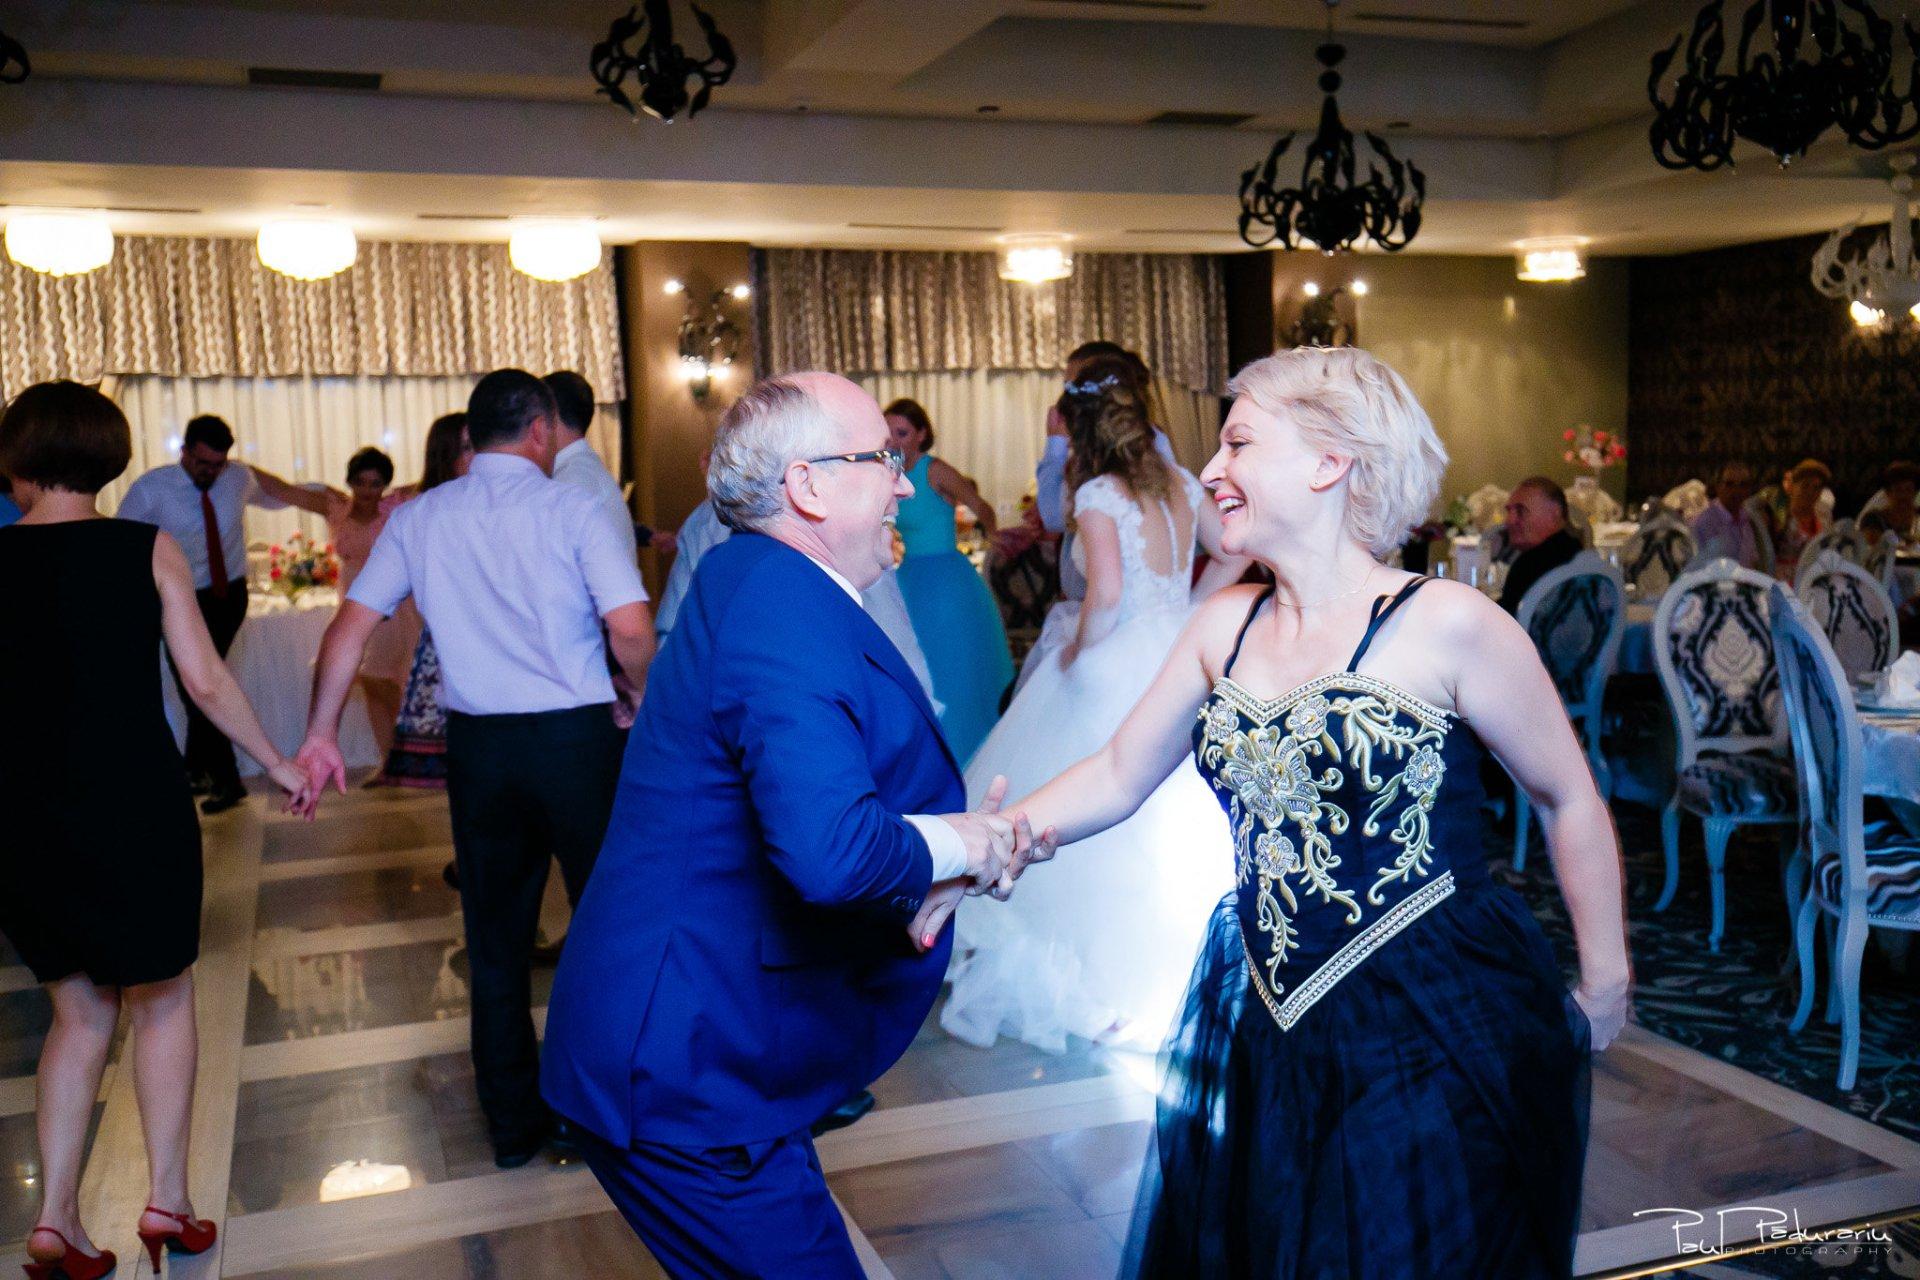 Nunta la Pleiada Iasi Alexandra si Vlad dans invitati petrecere 1 FotoShock www.paulpadurariu.ro © 2017 Paul Padurariu fotograf de nunta iasi